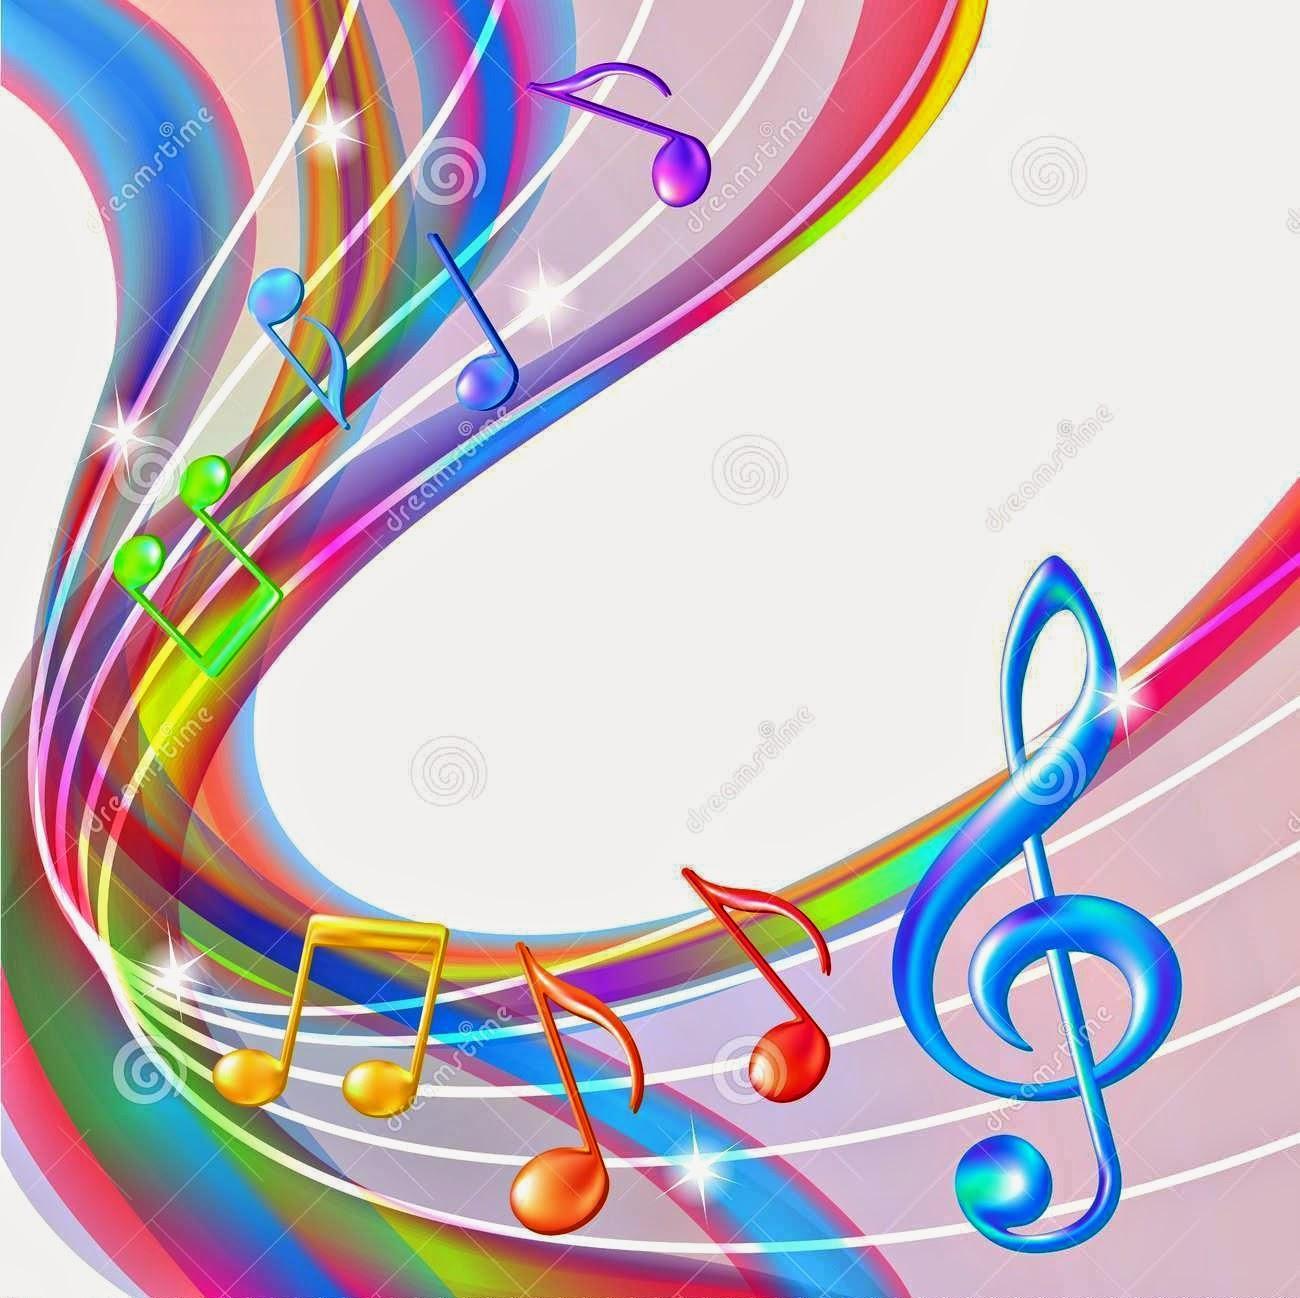 Music_Illustration.jpg